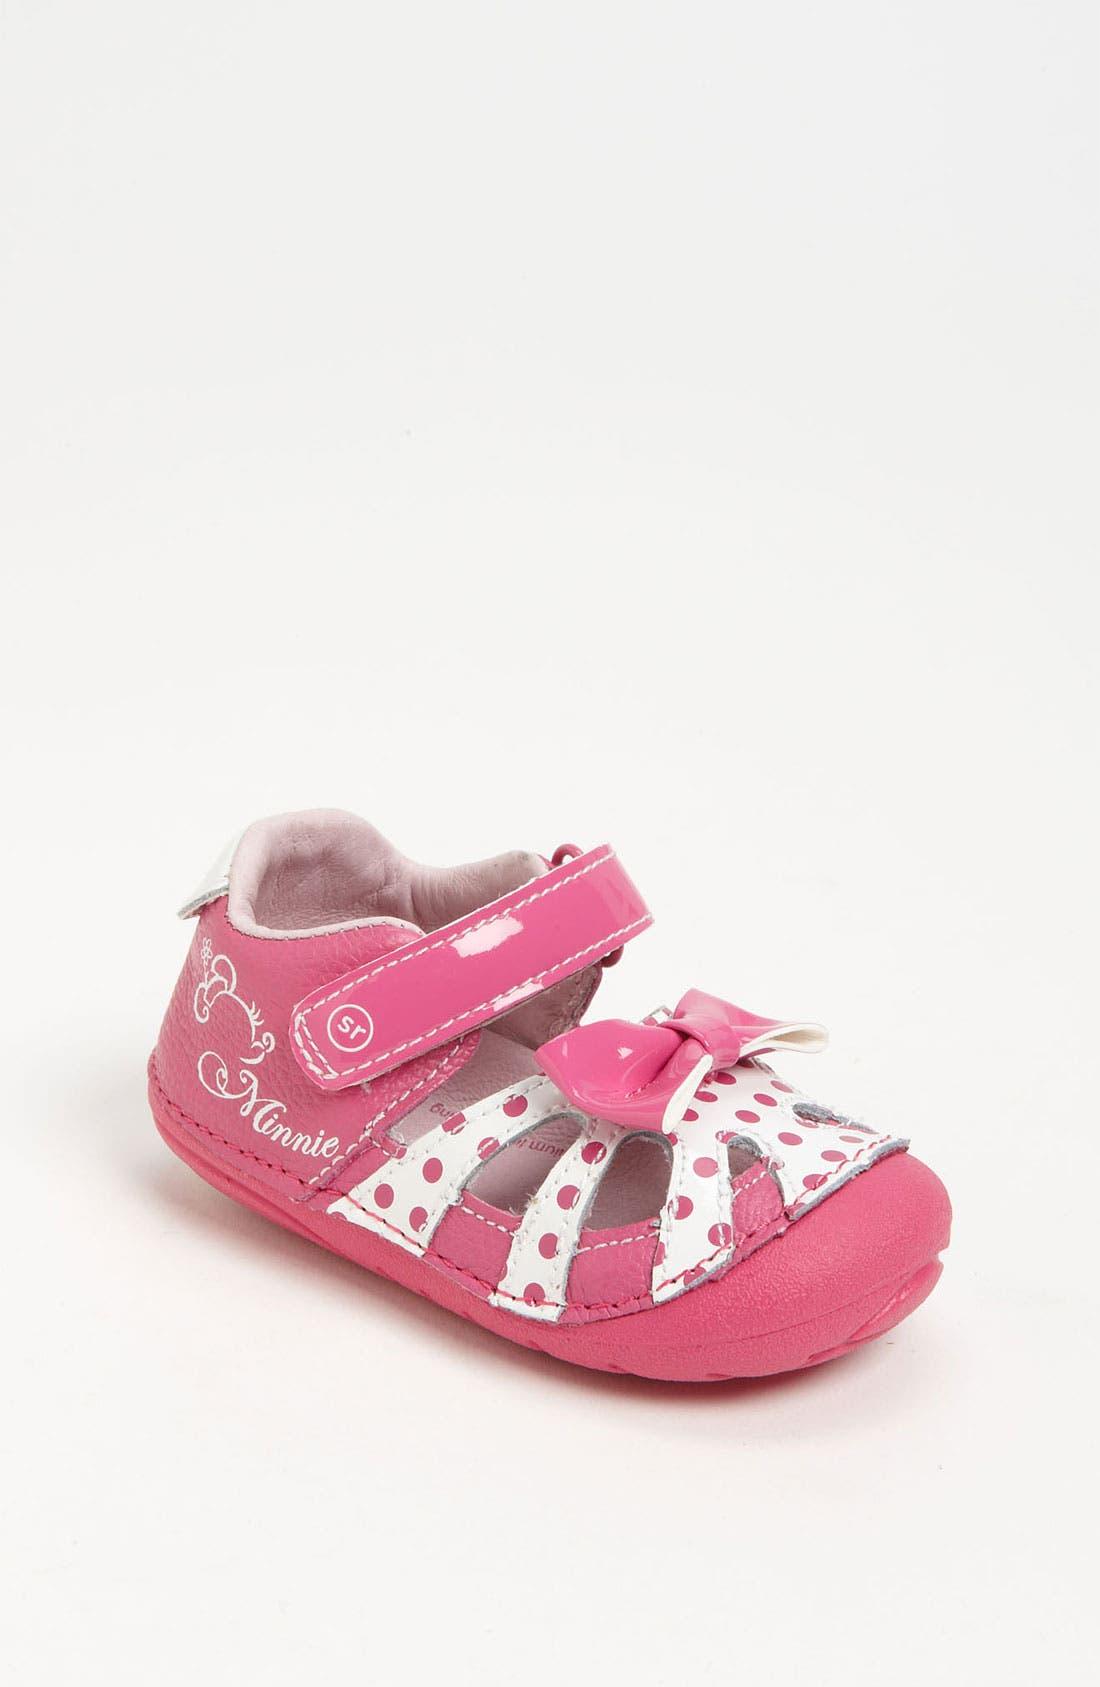 Main Image - Stride Rite 'Minnie' Sandal (Baby & Walker)